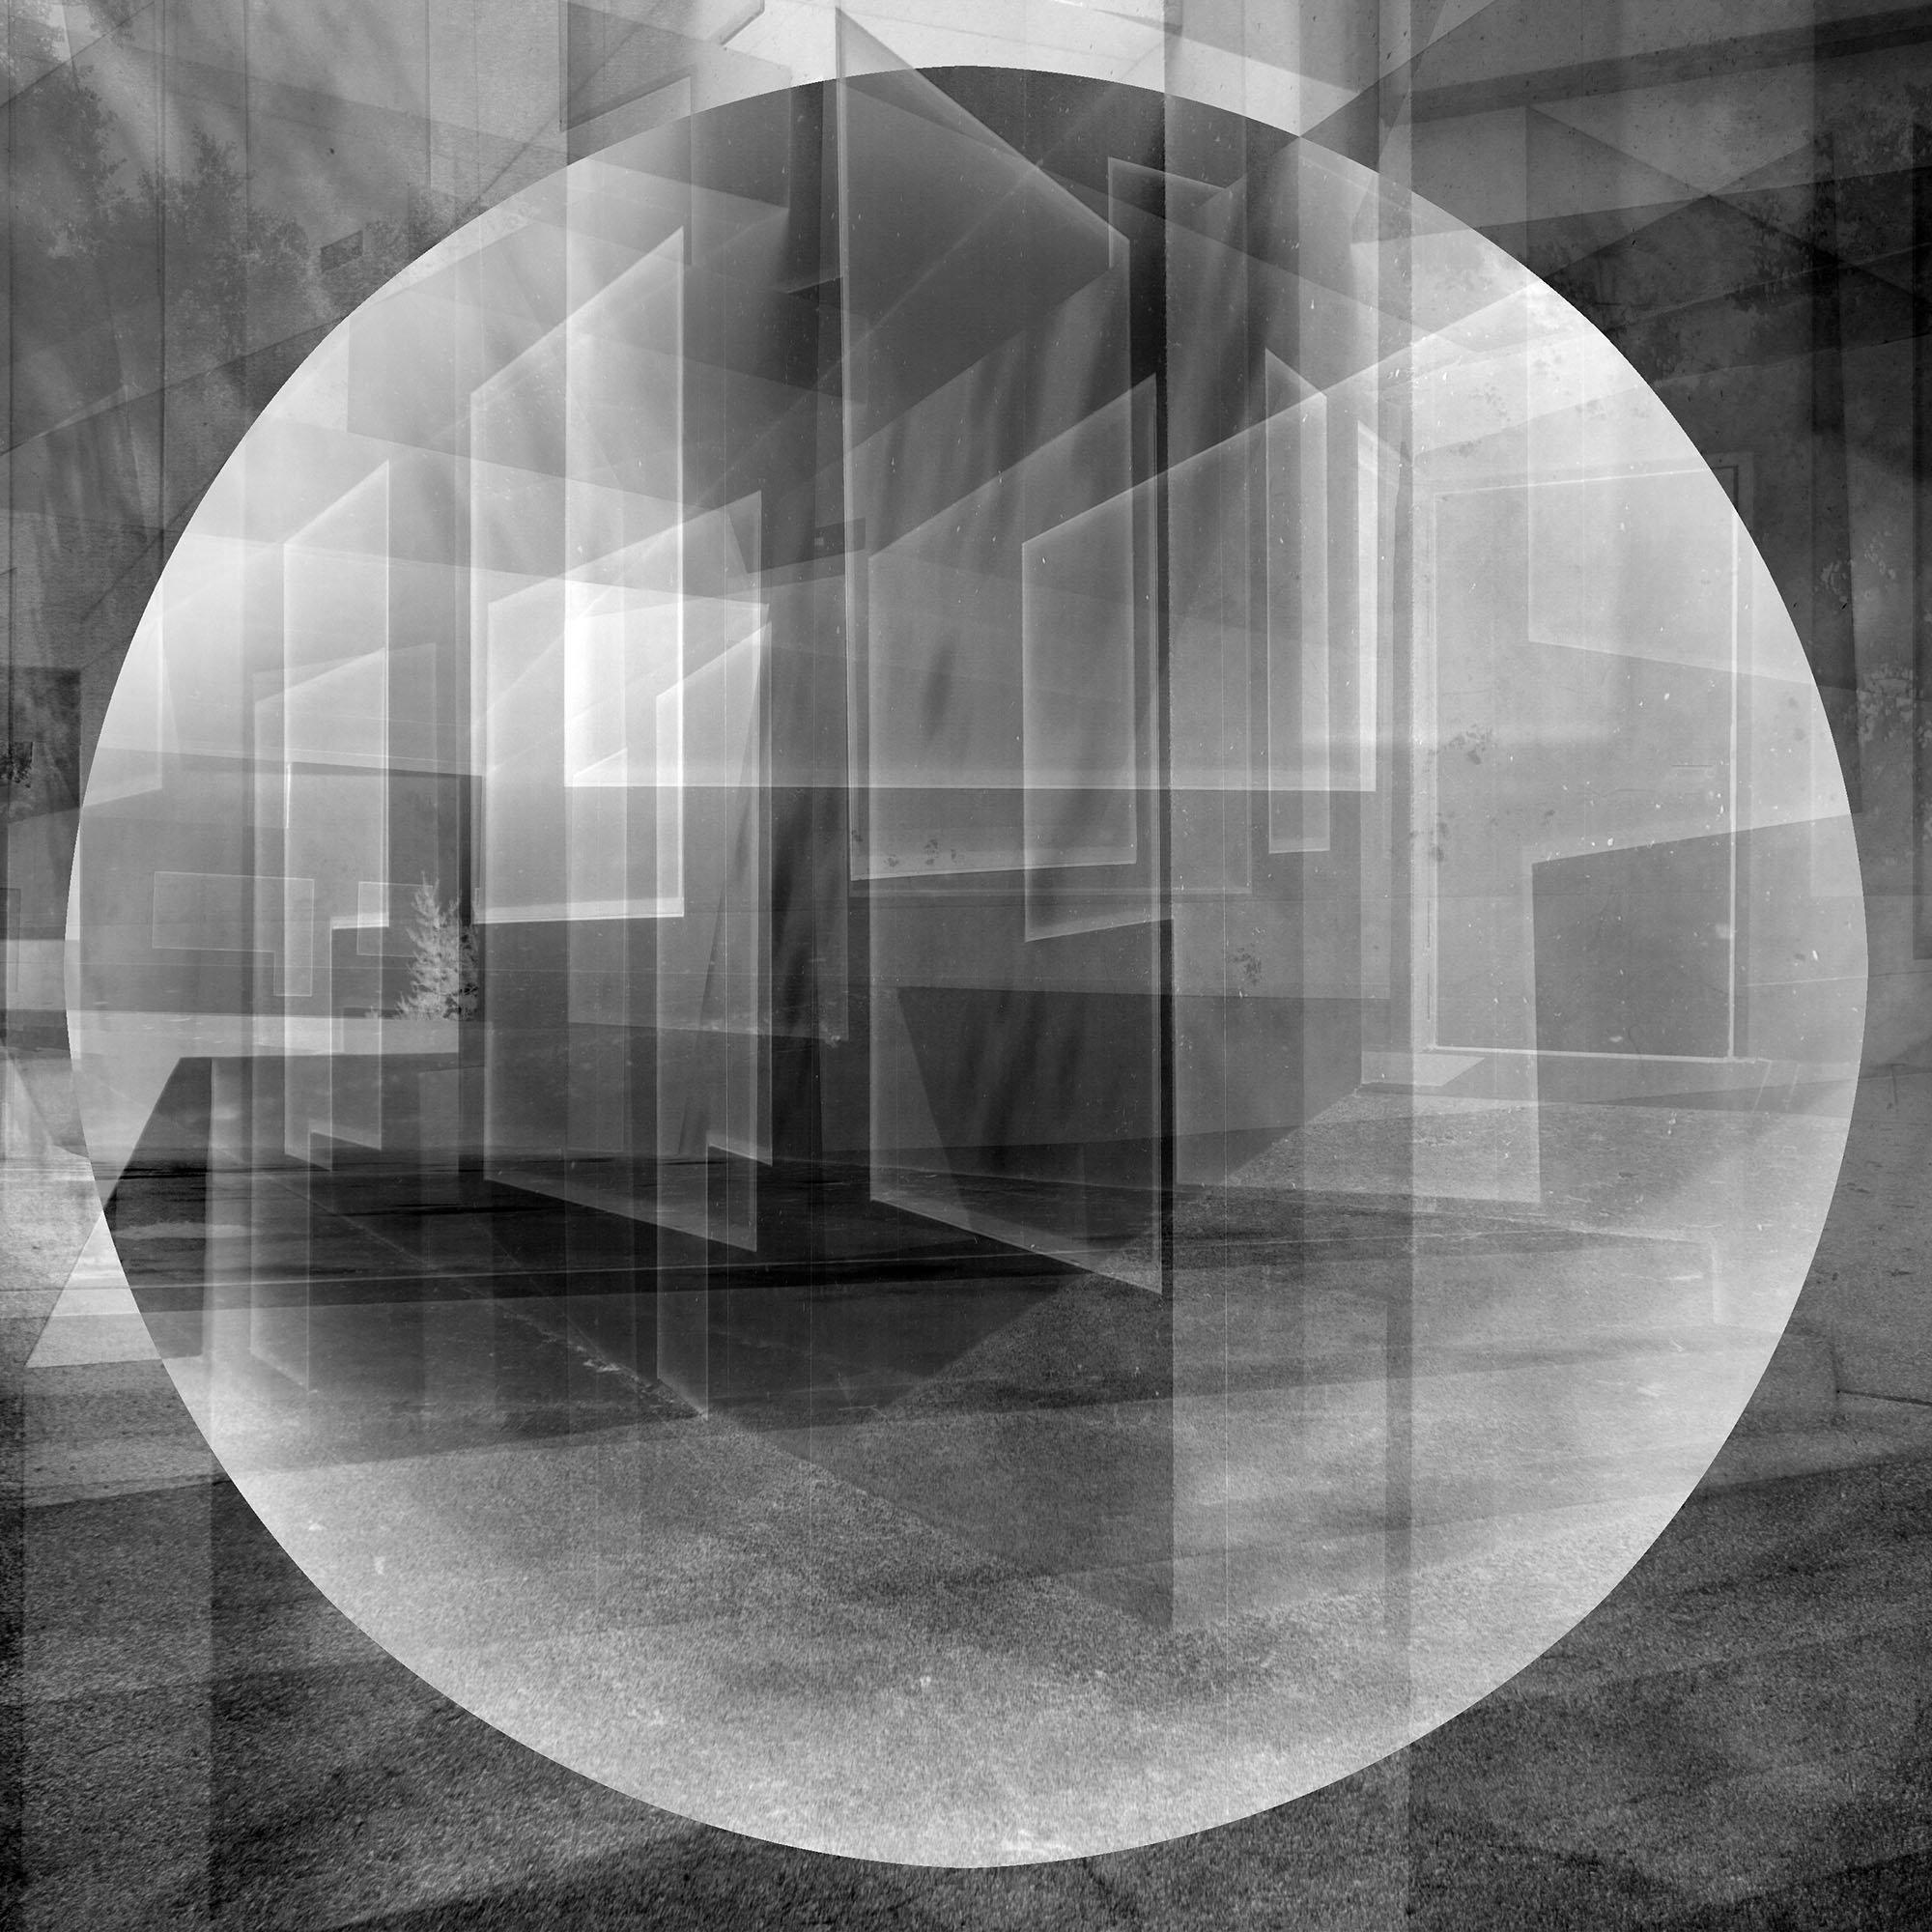 finalisti Architettura Professional Sony World Photography Awards 2021